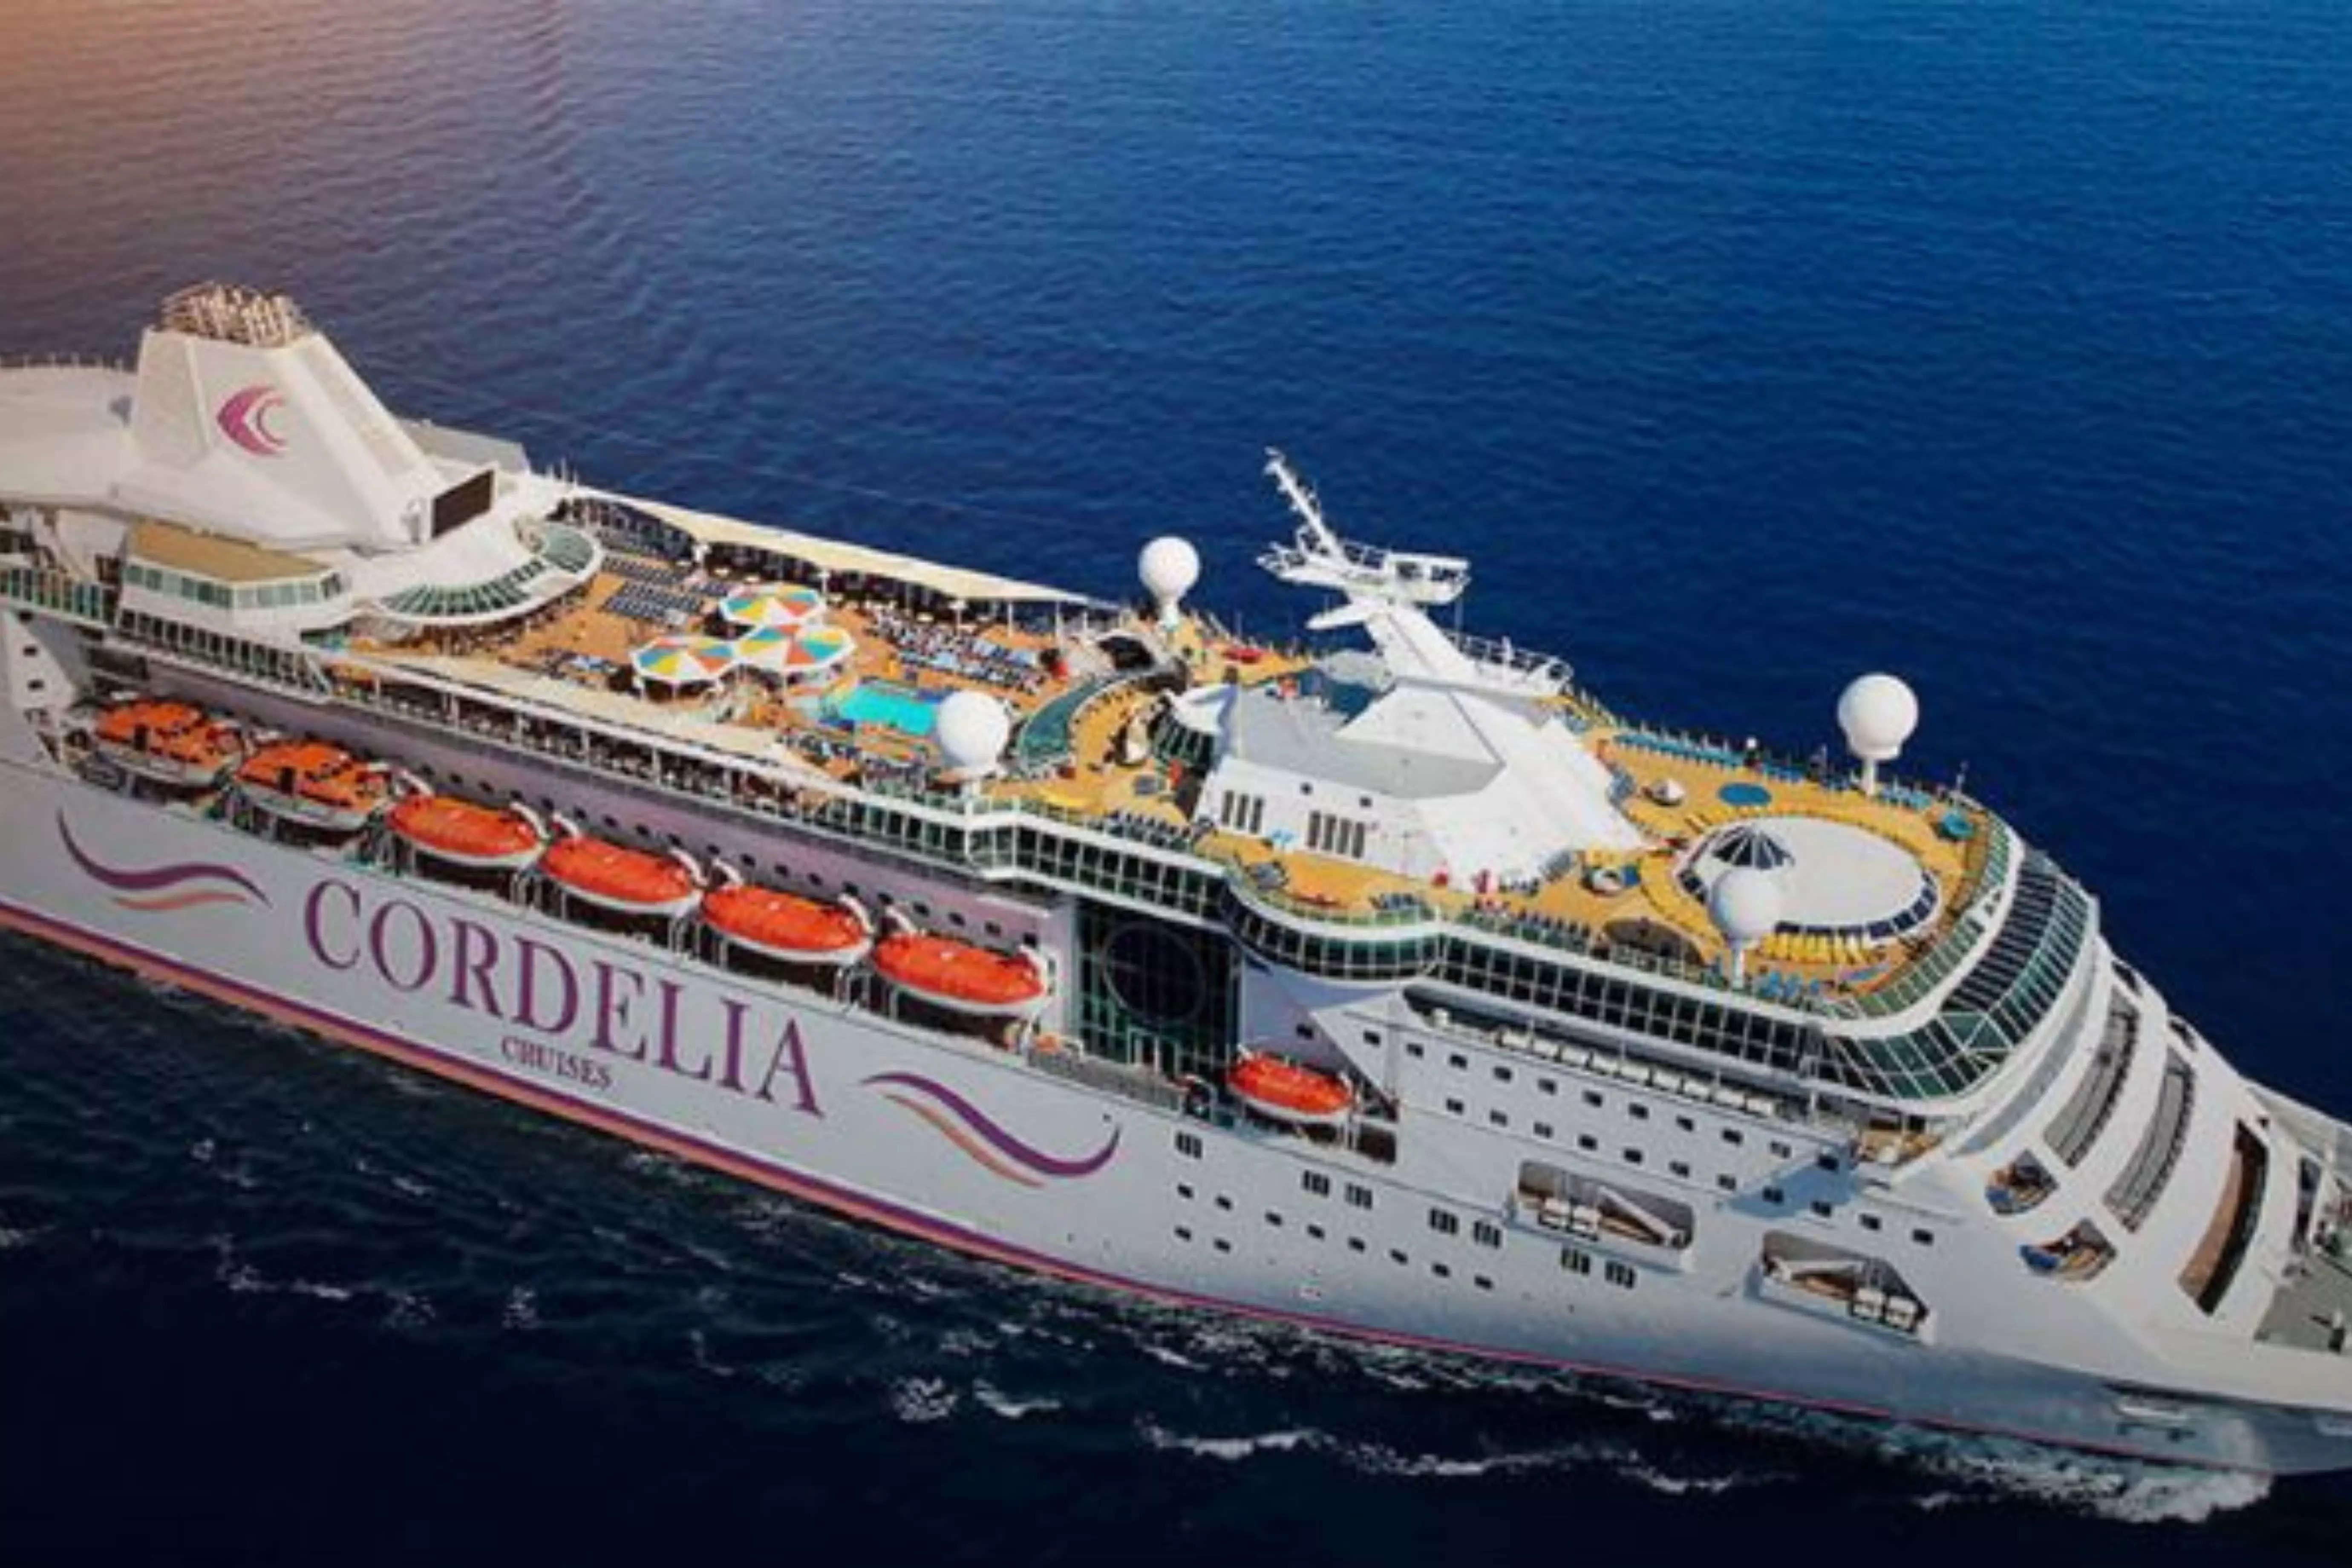 Cruise tourism industry defends Cordelia highlighting cruising protocols